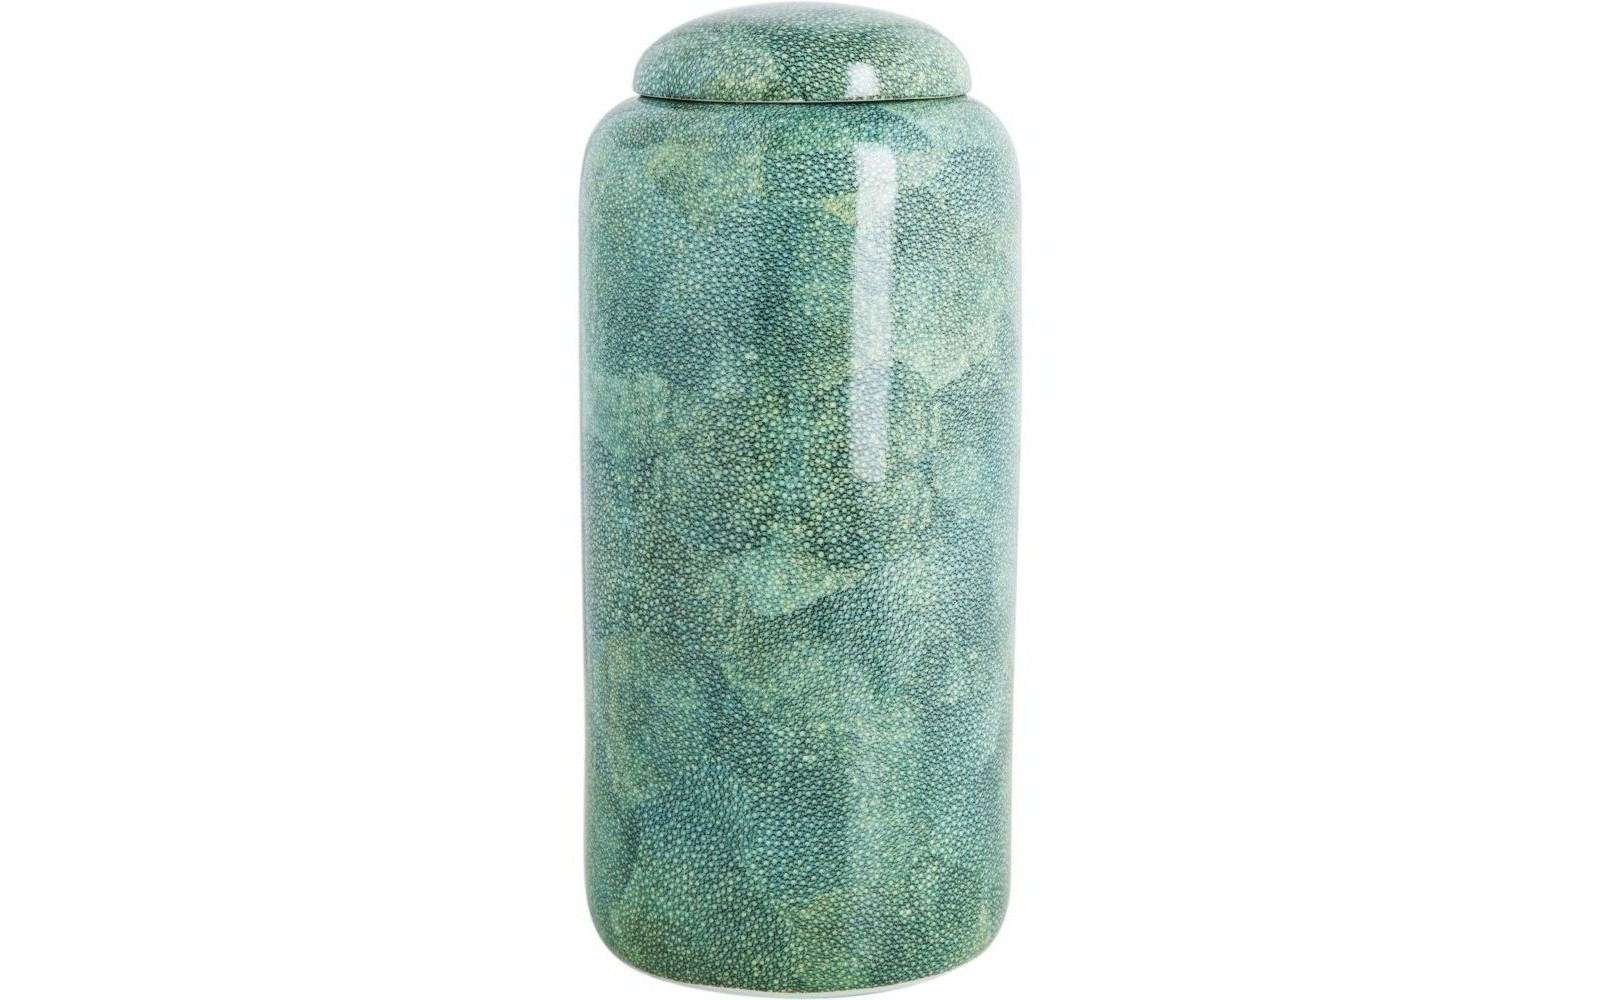 Ваза настольная AnacondaВазы<br><br><br>Material: Керамика<br>Высота см: 47.0